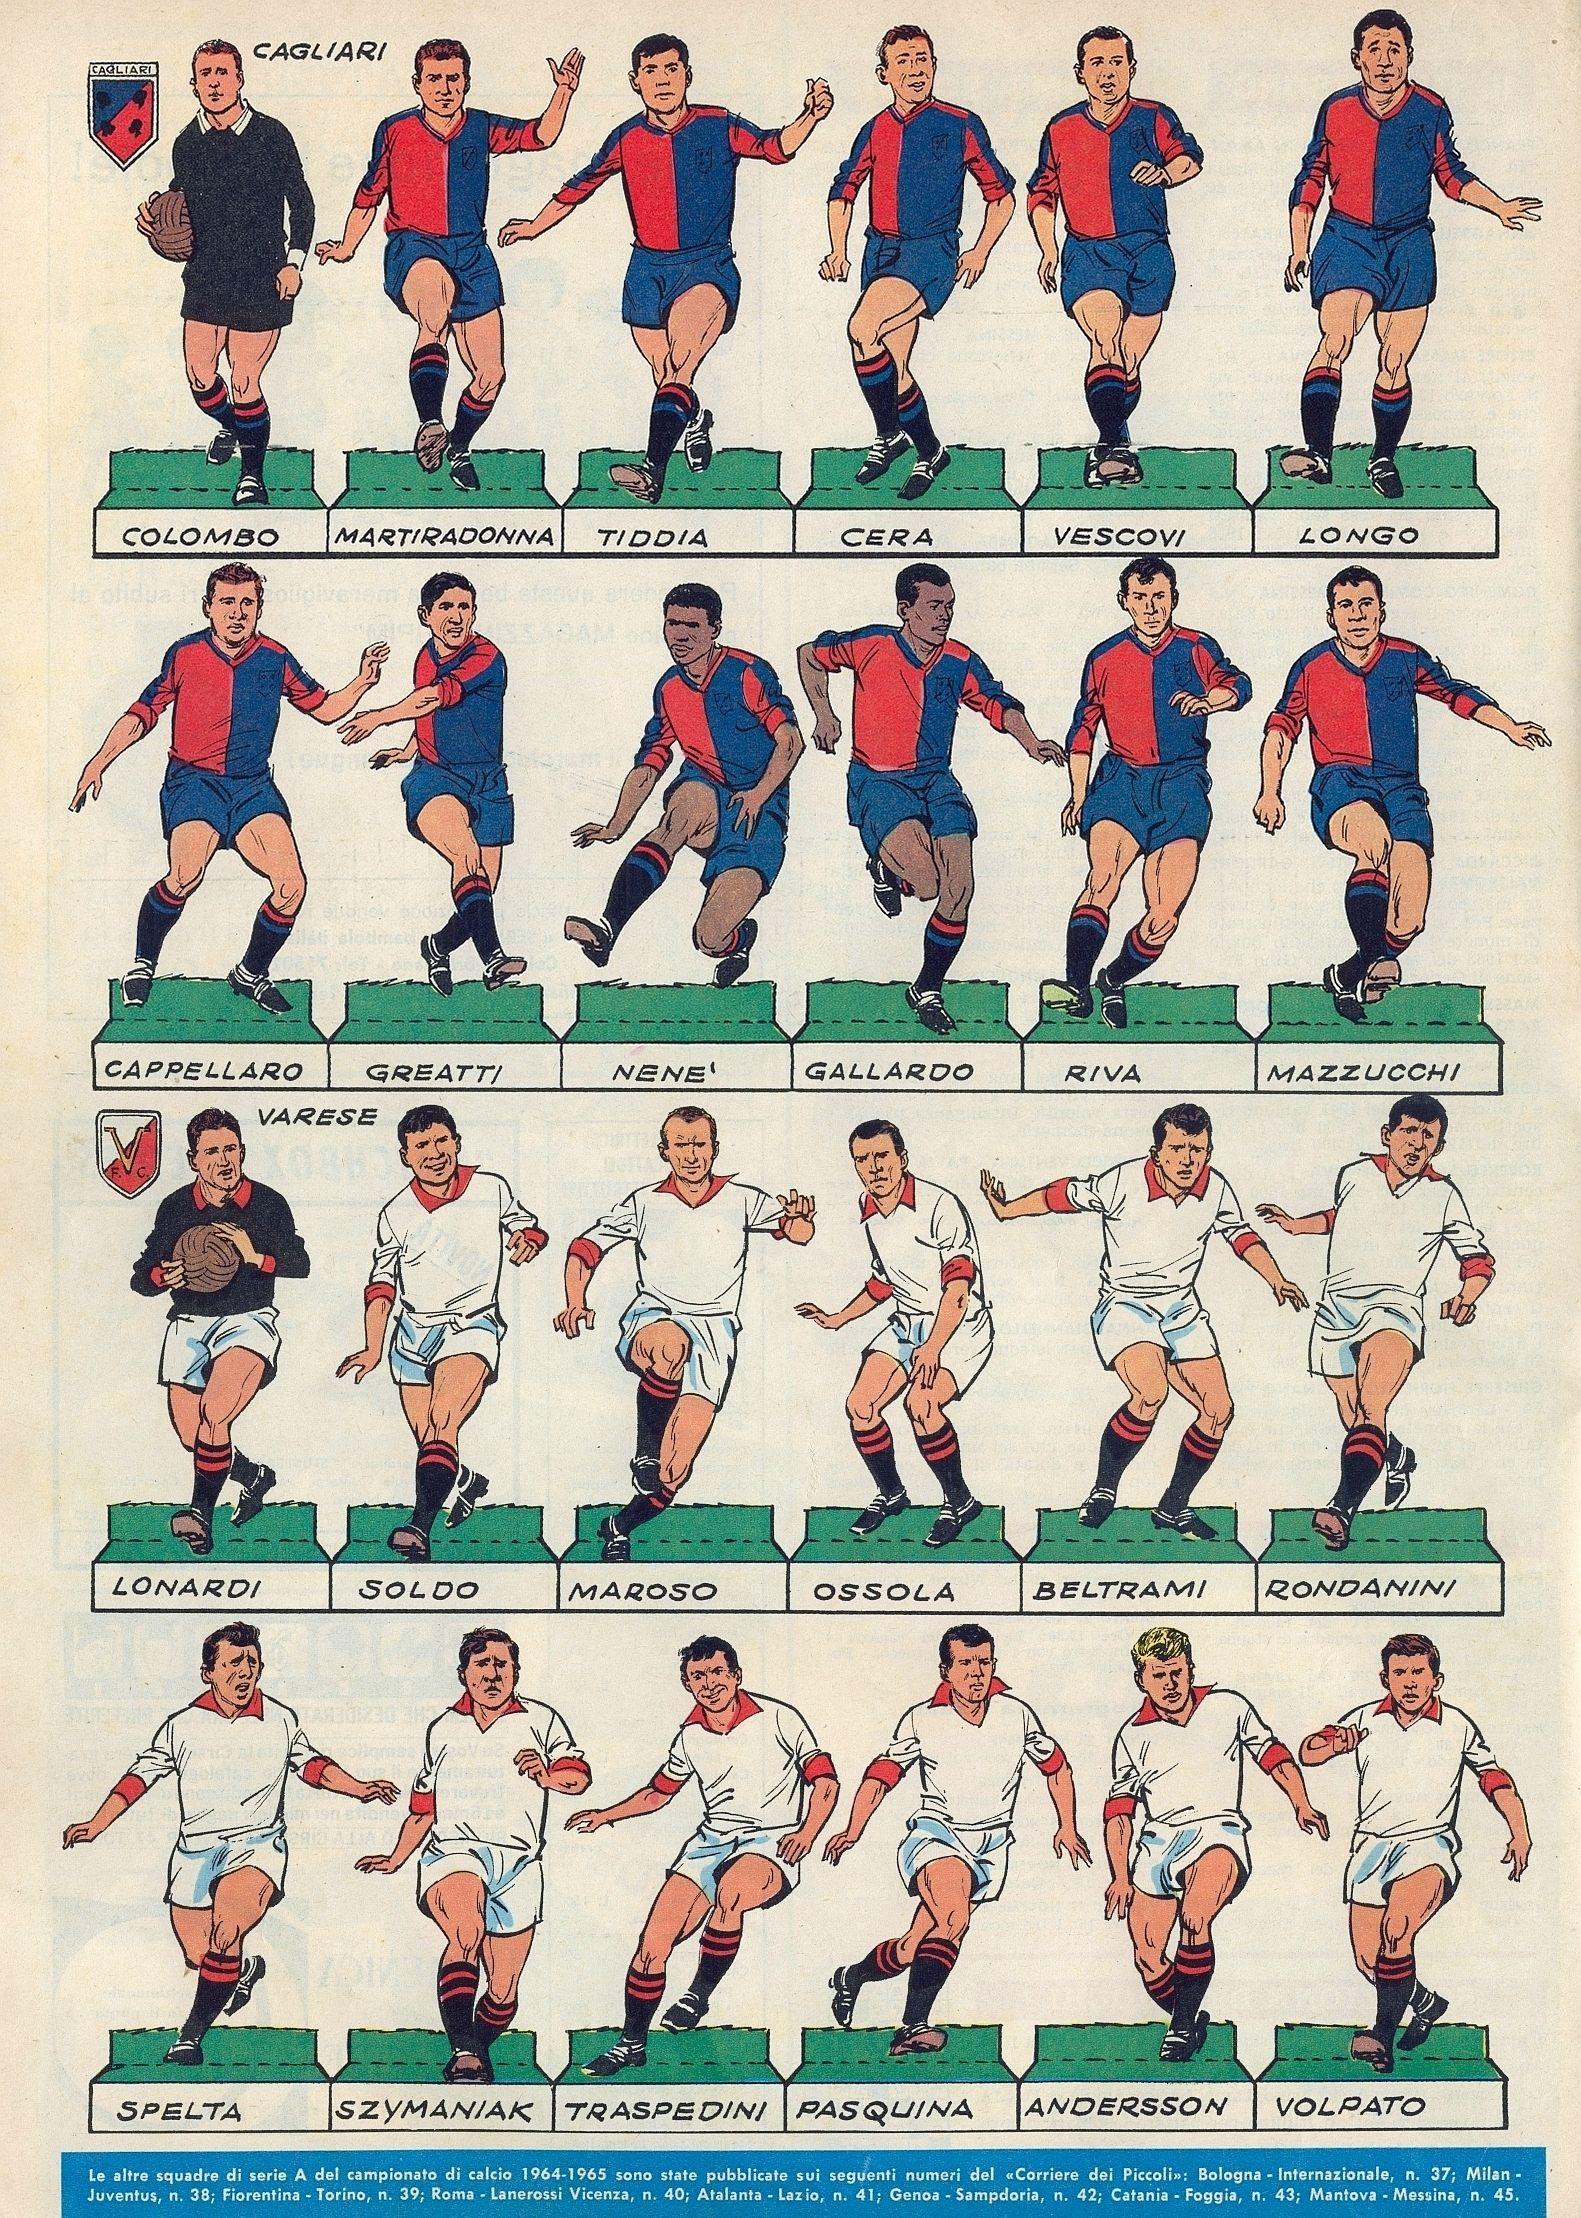 Serie A 1964/65 Calciatori, Calcio, Figurine di calcio